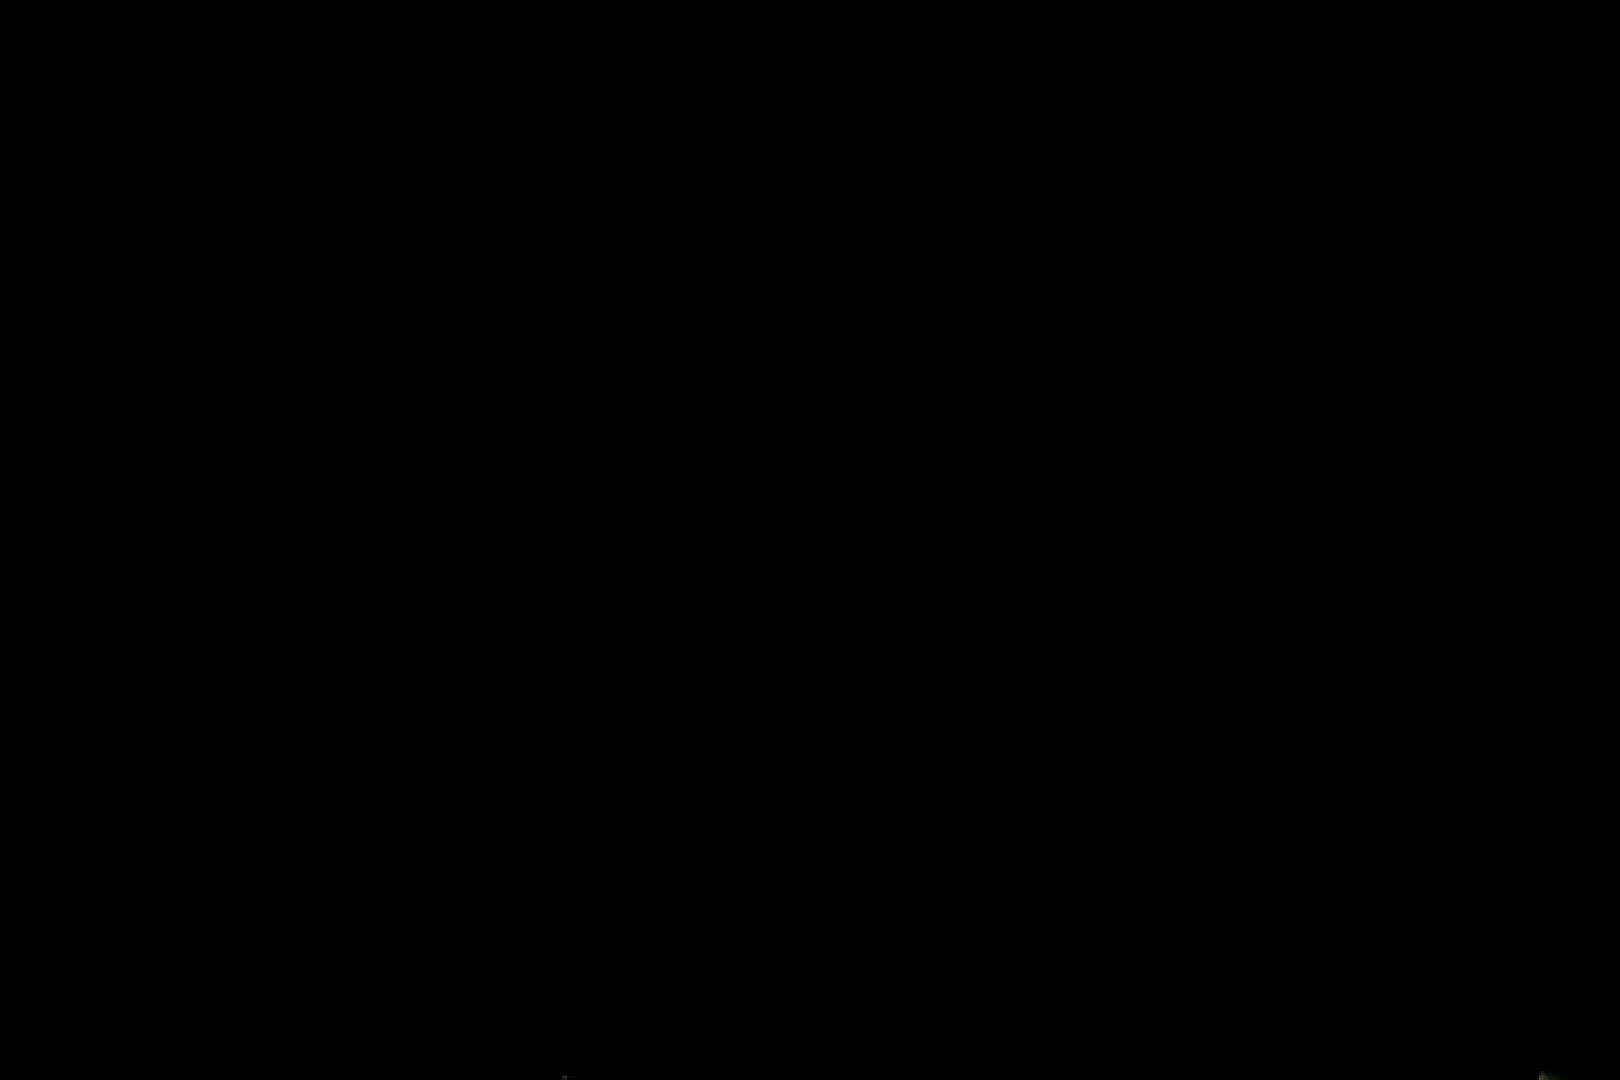 充血監督の深夜の運動会Vol.124 赤外線 オメコ無修正動画無料 97画像 53